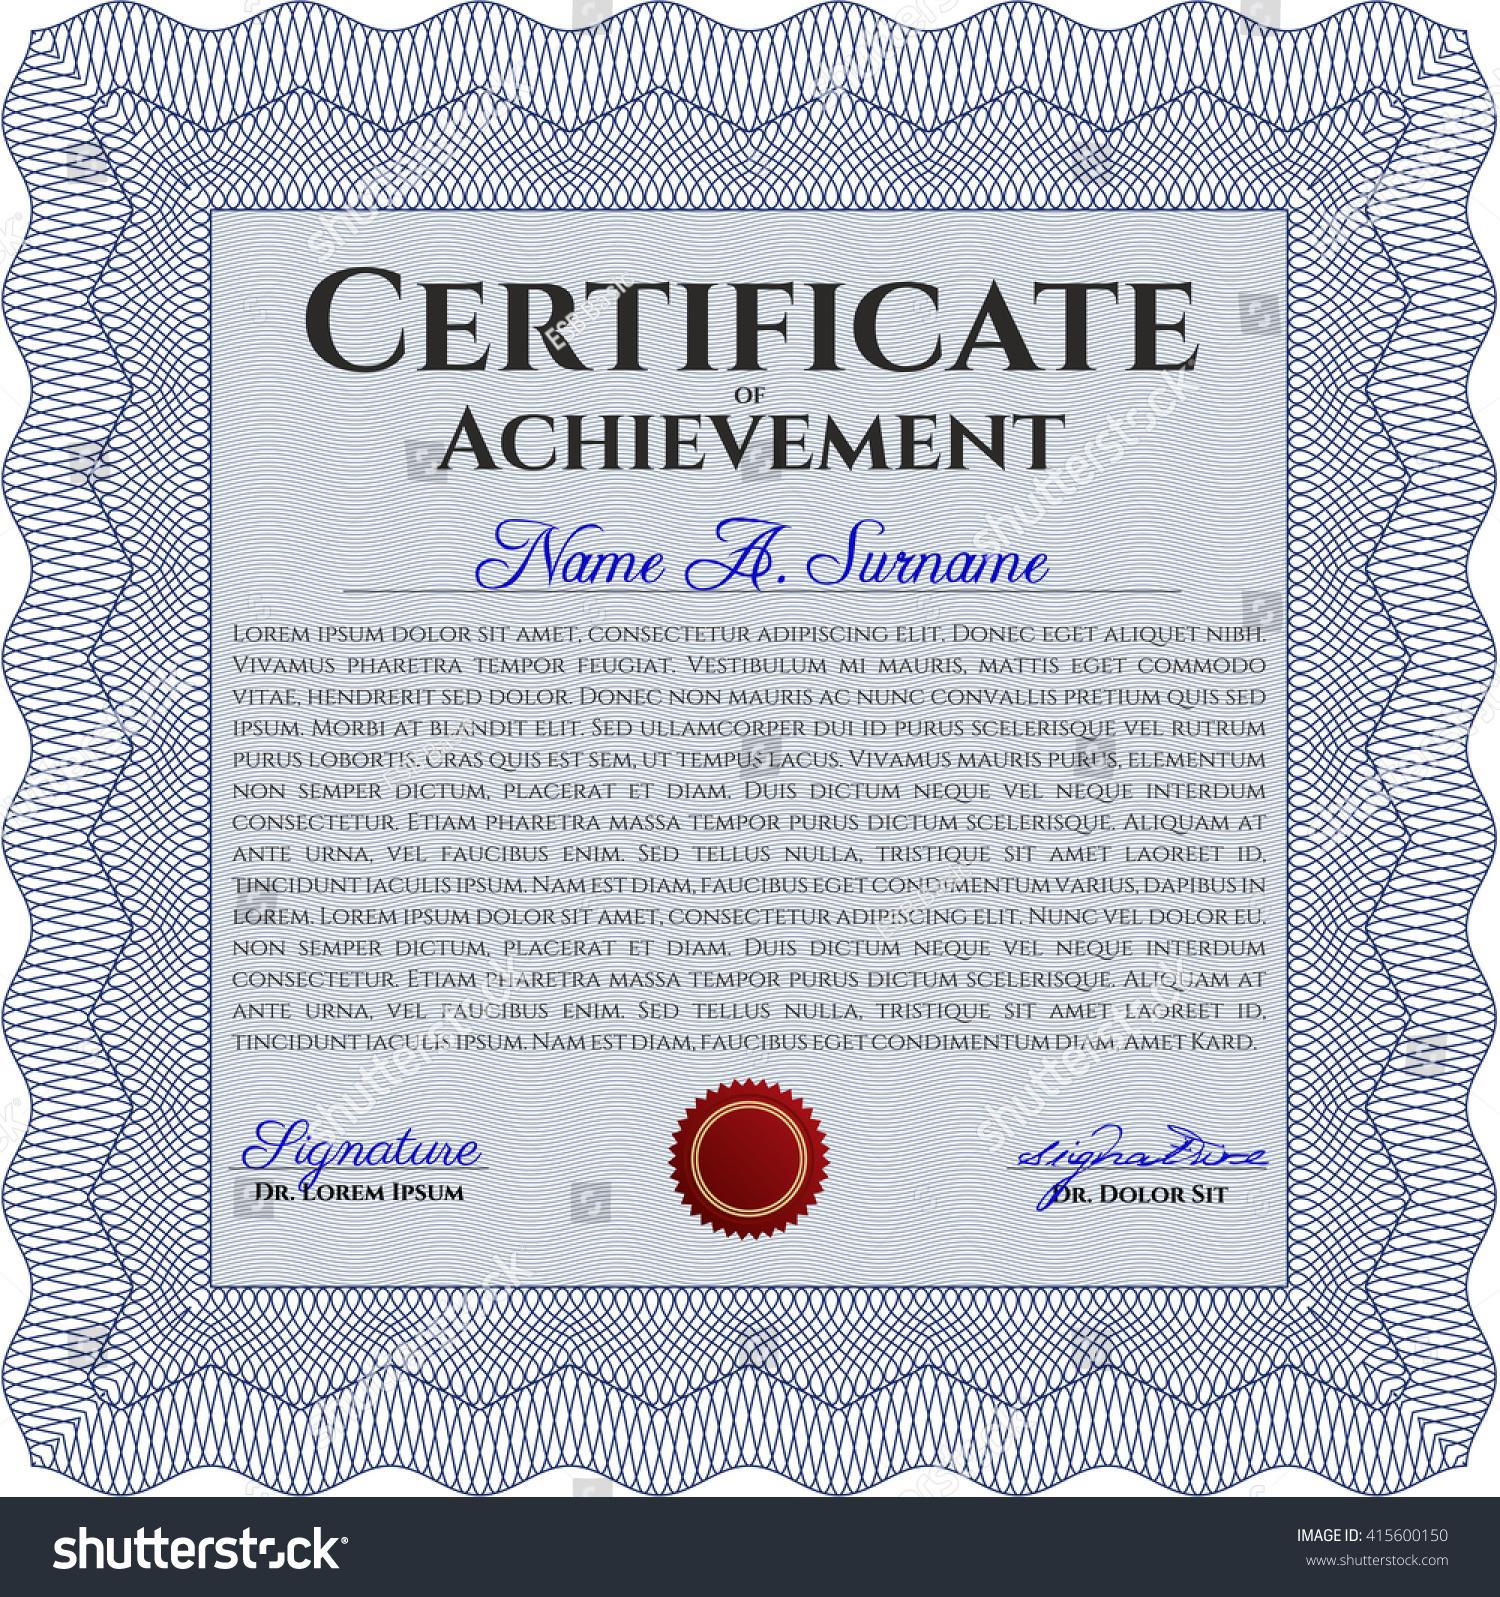 Scholastic achievement certificate template choice image scholastic achievement certificate template images certificate scholastic achievement certificate template image collections scholastic achievement yadclub Image collections